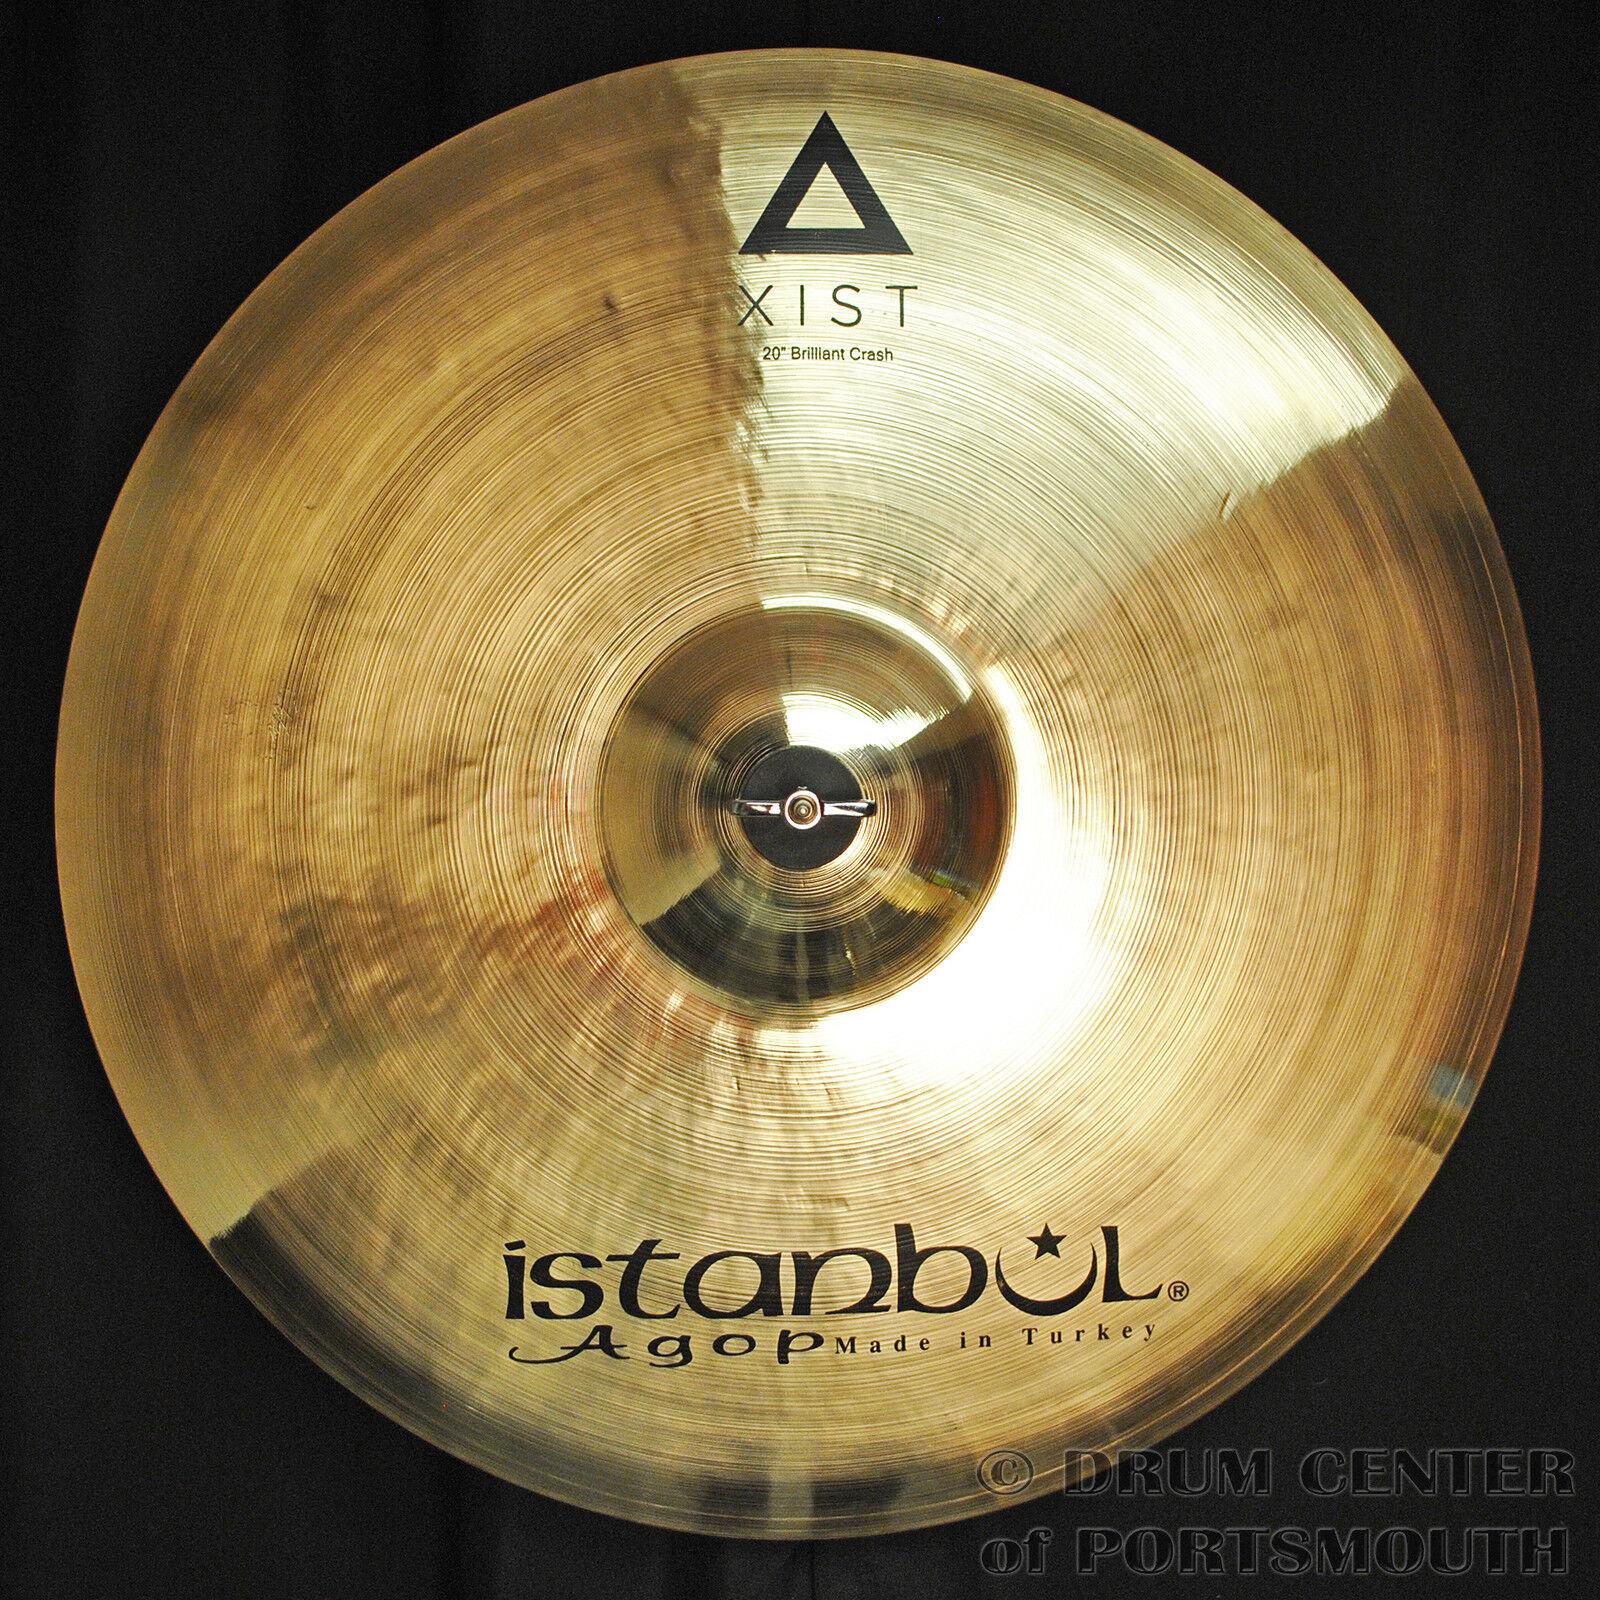 Istanbul Agop Xist Brilliant Crash Cymbal 20  - Video Demo